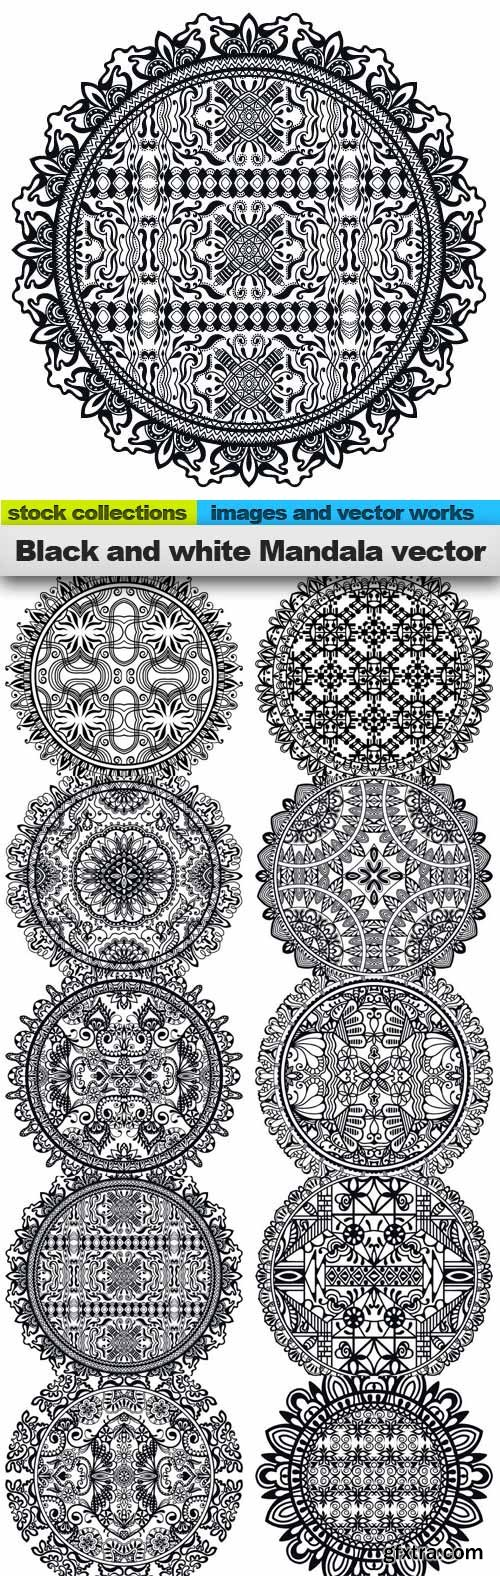 Black and white Mandala vector, 10 x EPS